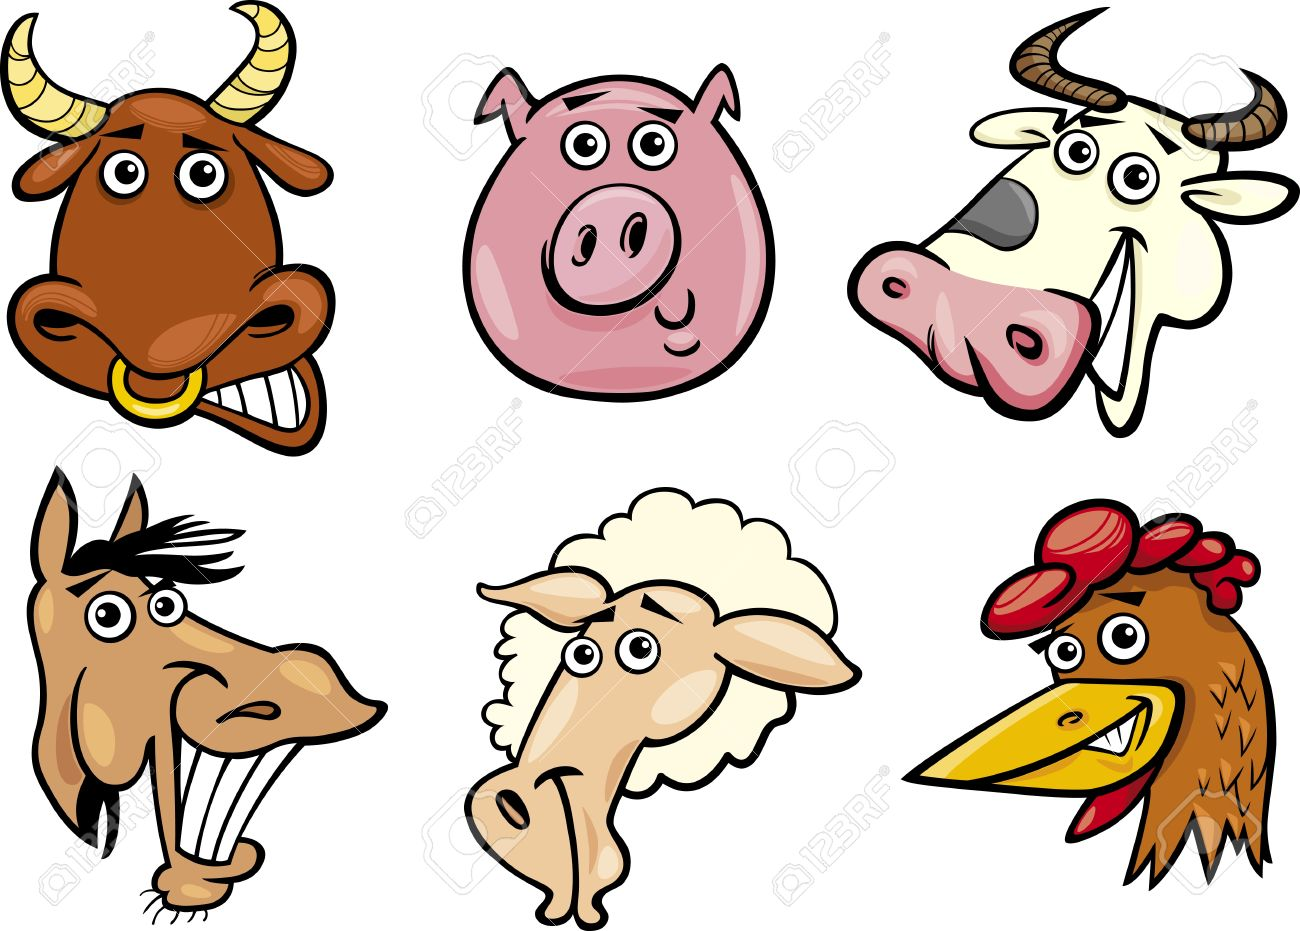 Funny Farm Animals Clipart-Funny Farm Animals Clipart-15